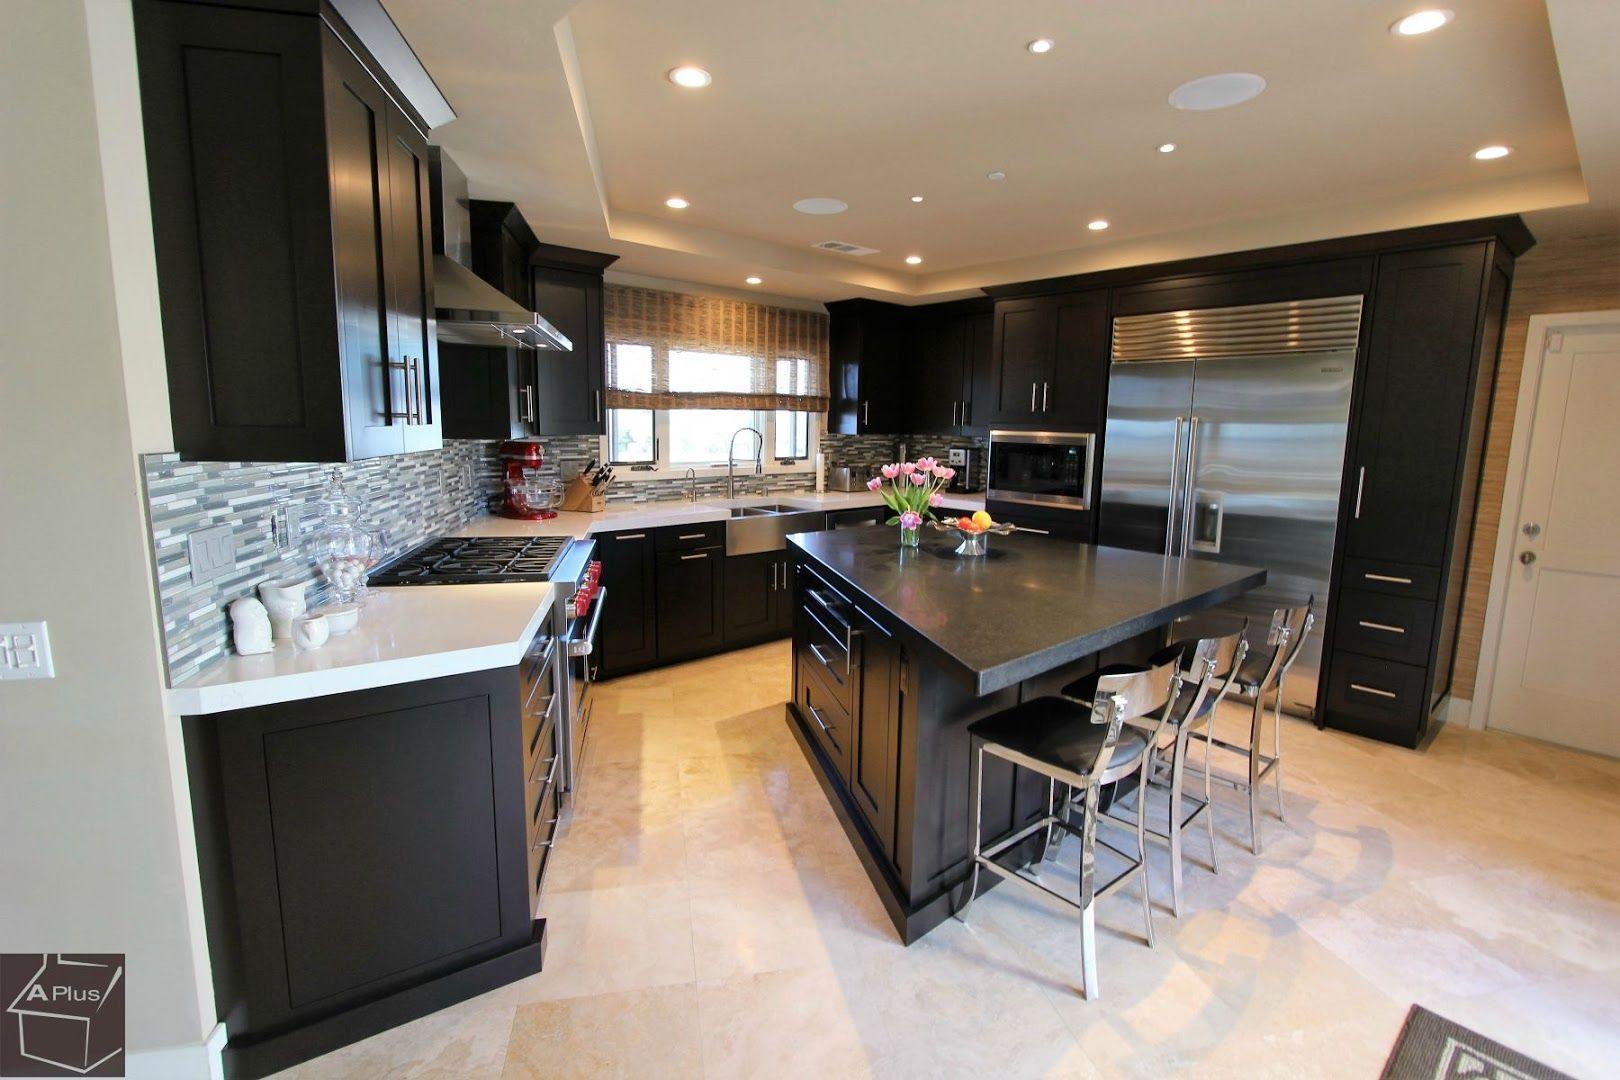 Dana Point Orange County Transitional Design Build Kitchen Remodel Kitchen Remodel White Laminate Countertops Interior Design And Remodeling